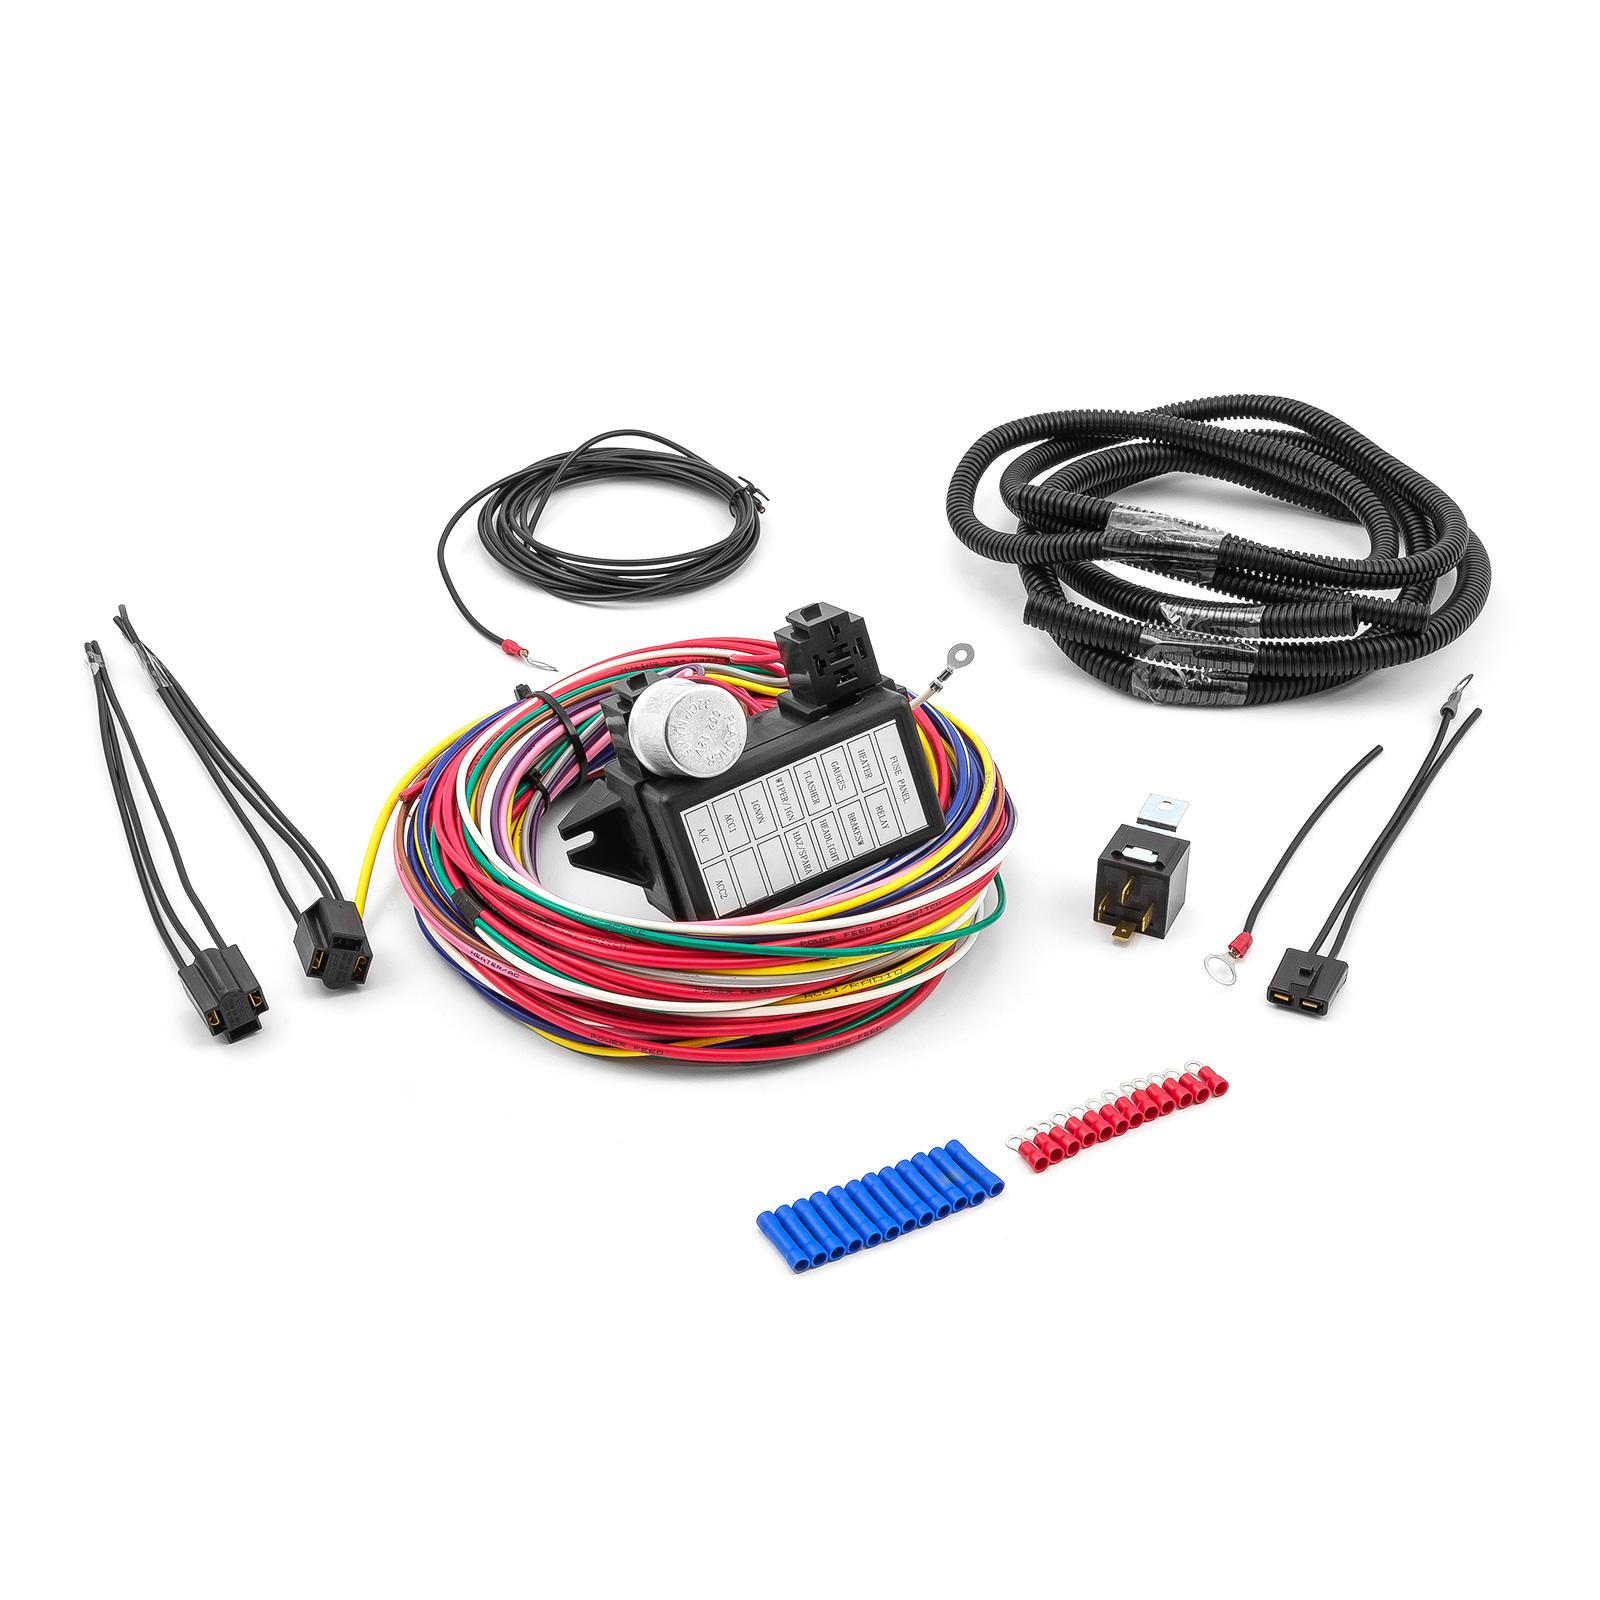 Universal 12 Circuit Wiring Harness Kit